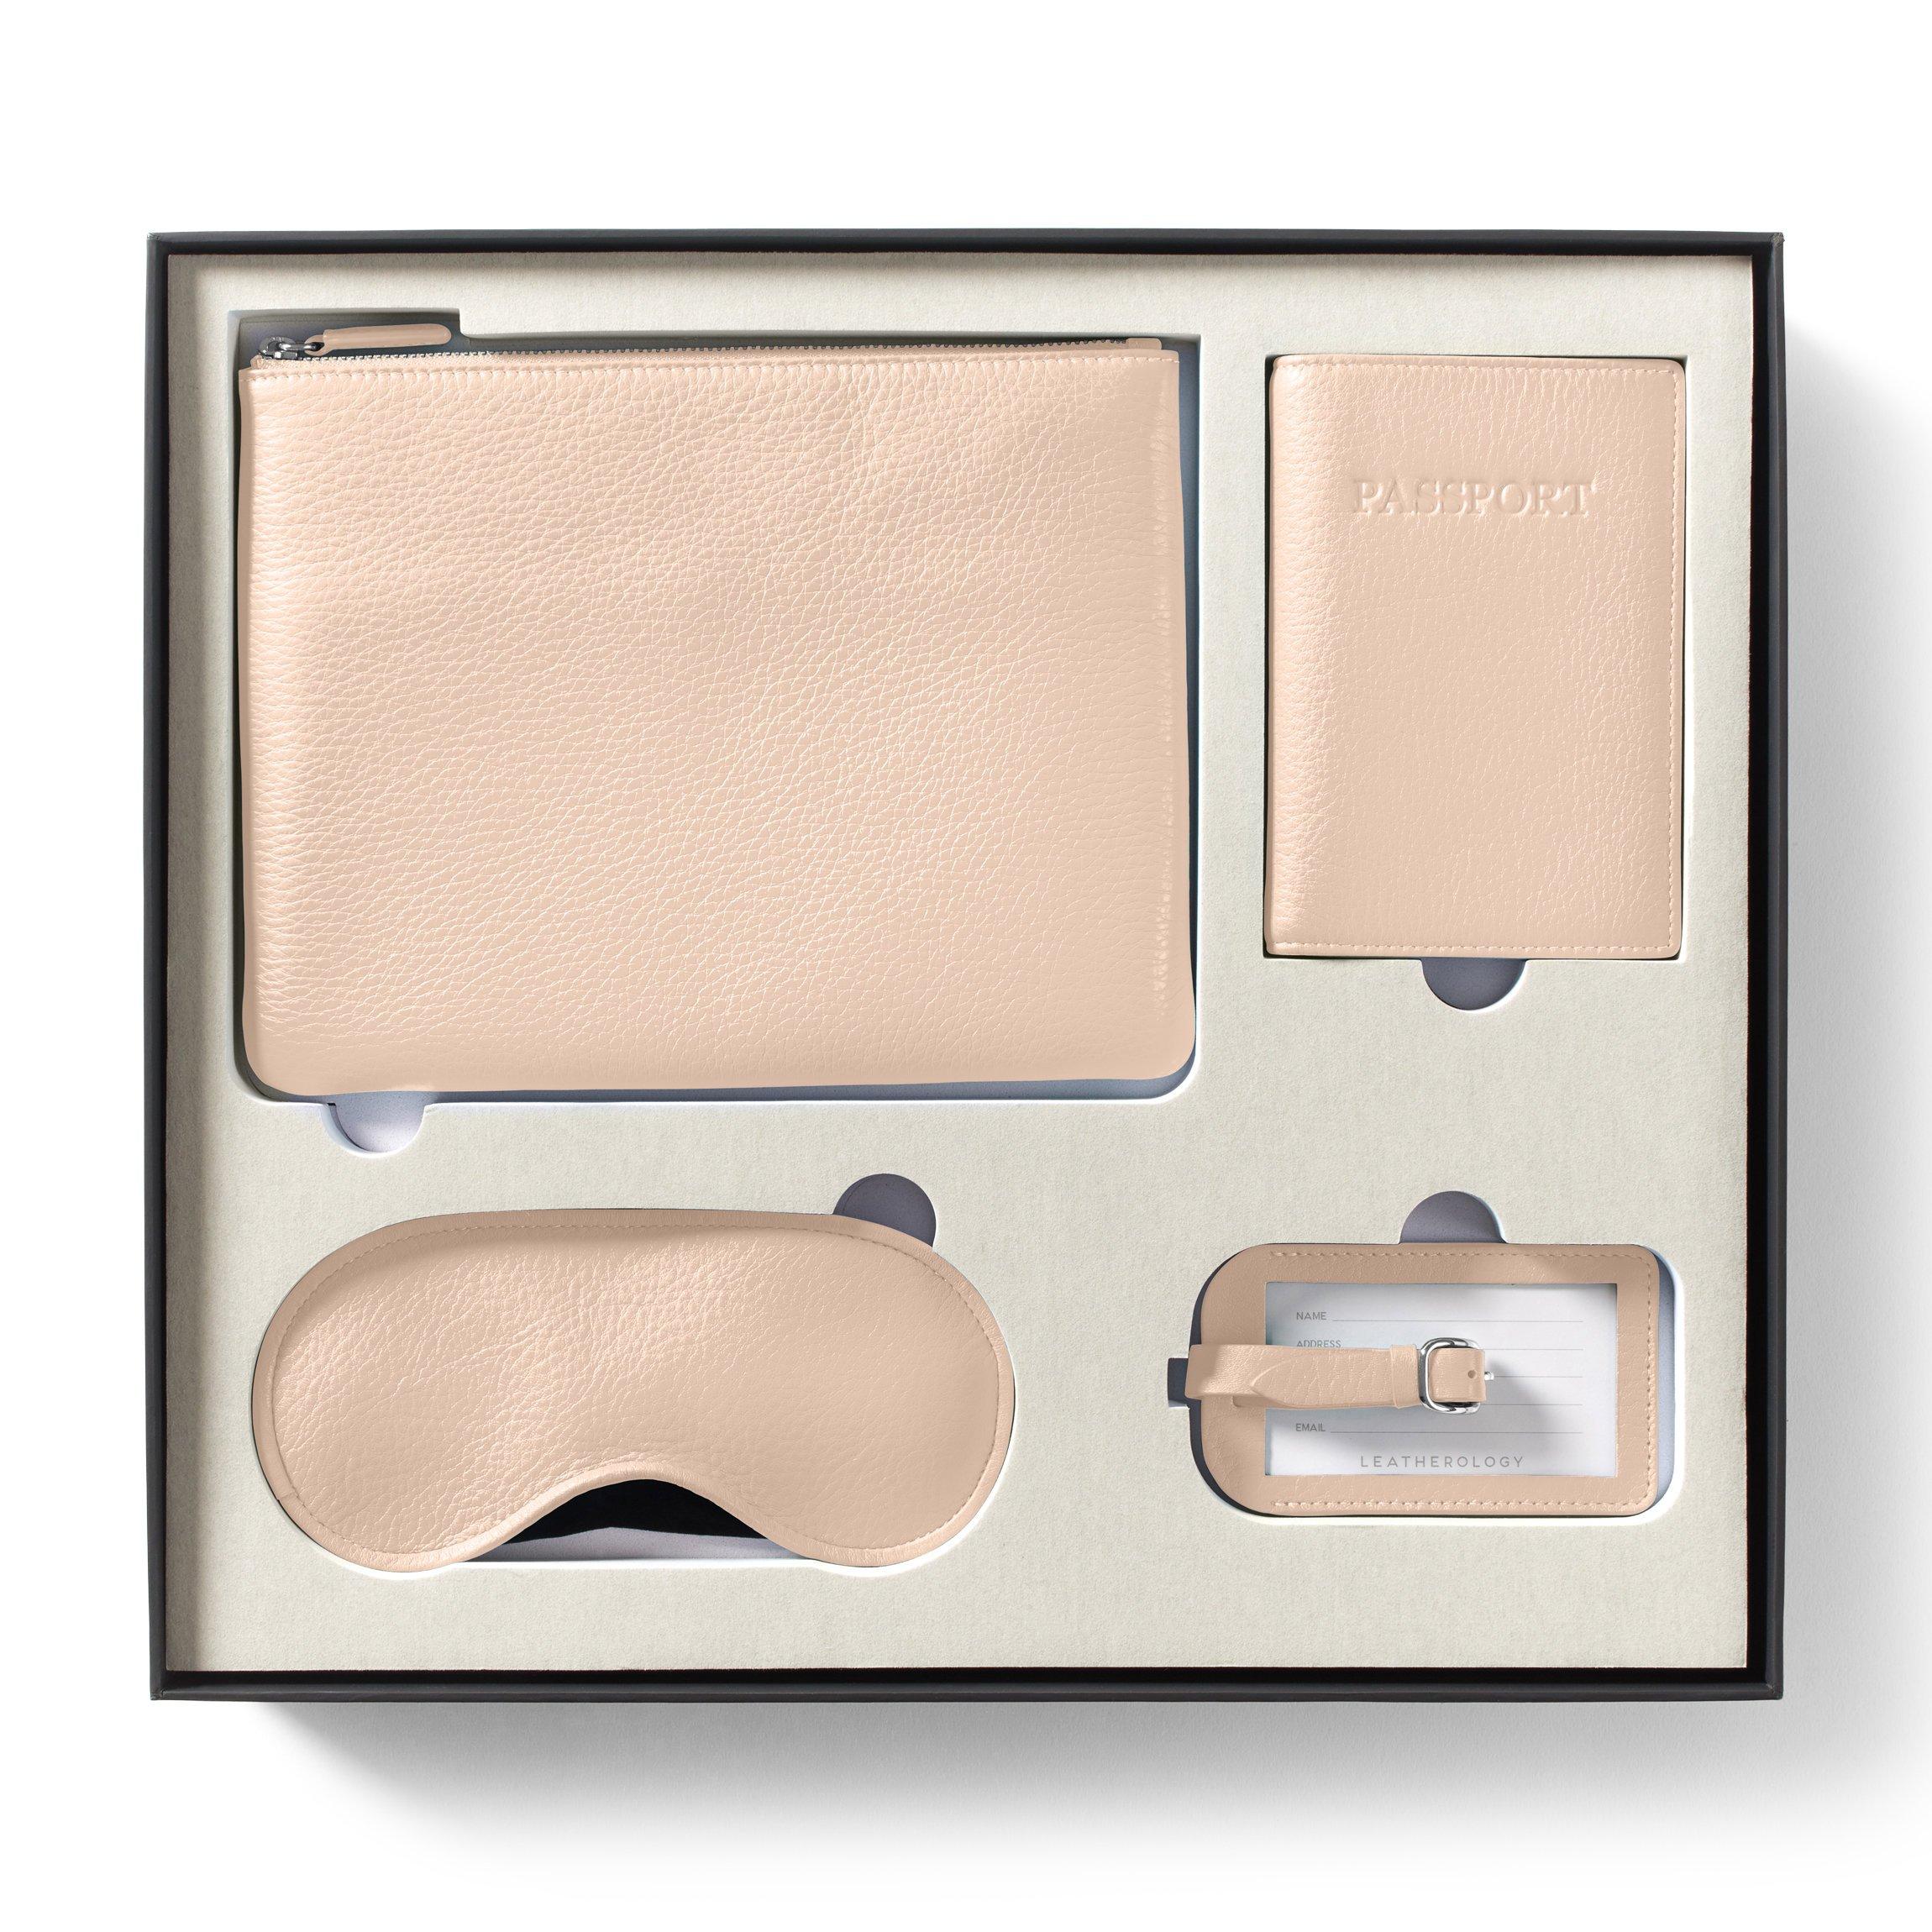 Leatherology Jetsetter Travel Gift Set for Her - Full Grain Leather Leather - Rose (pink)